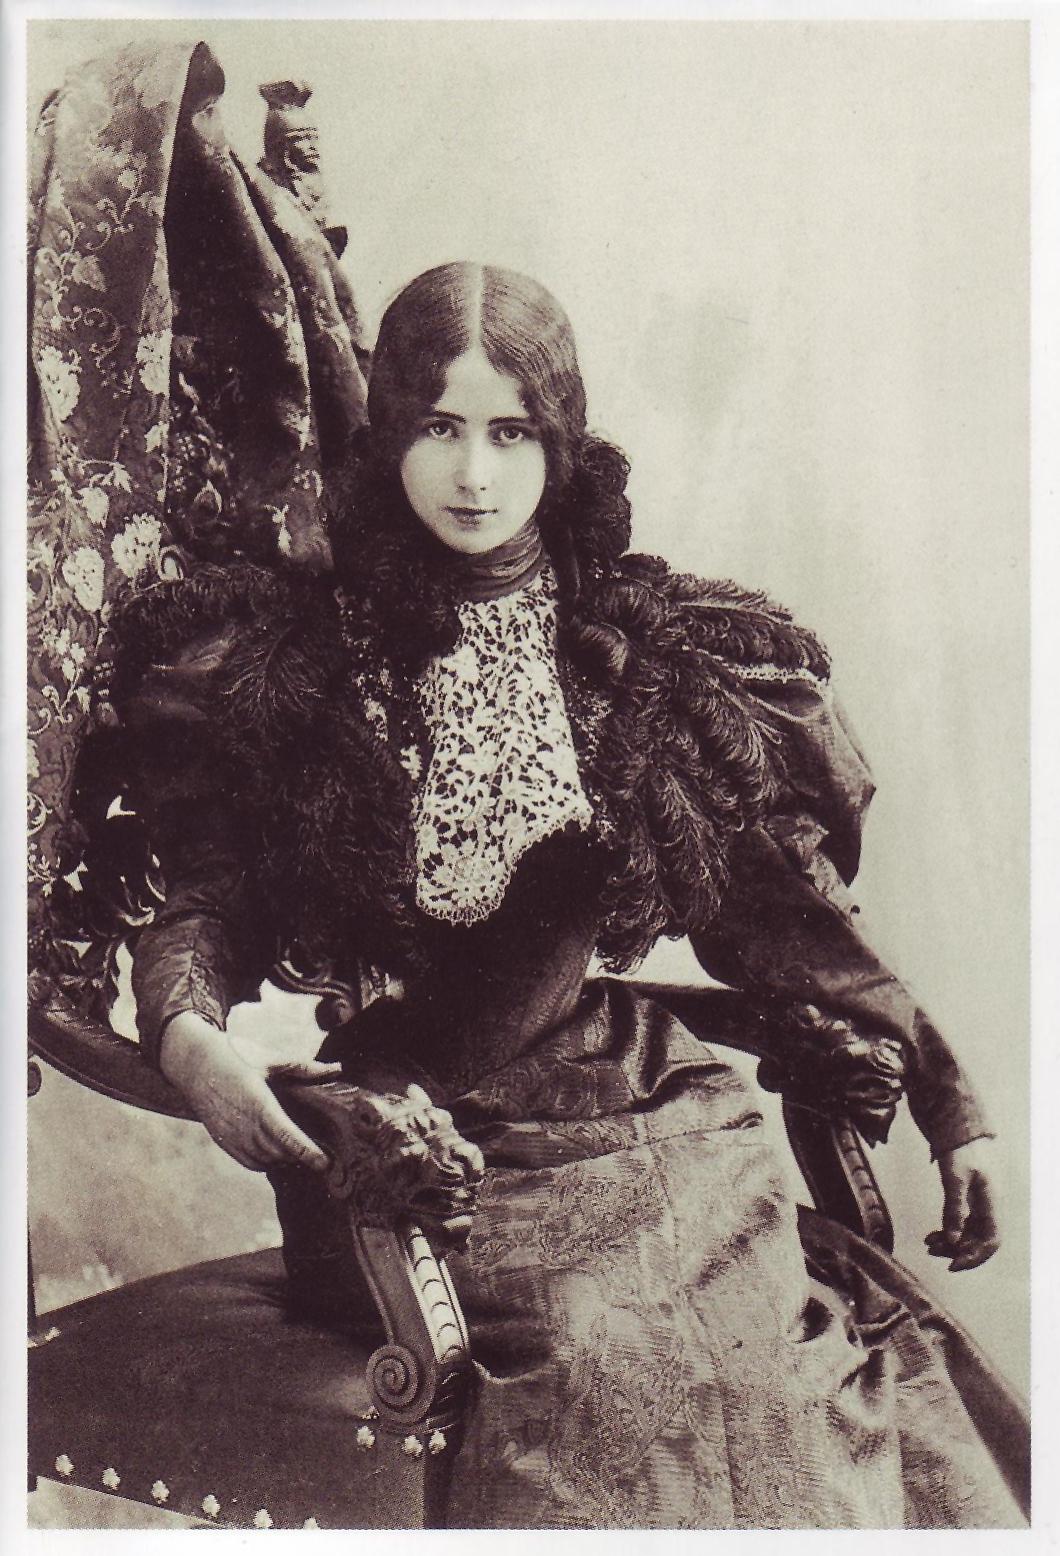 File:MERODE-par-OGERAU-1895.jpg